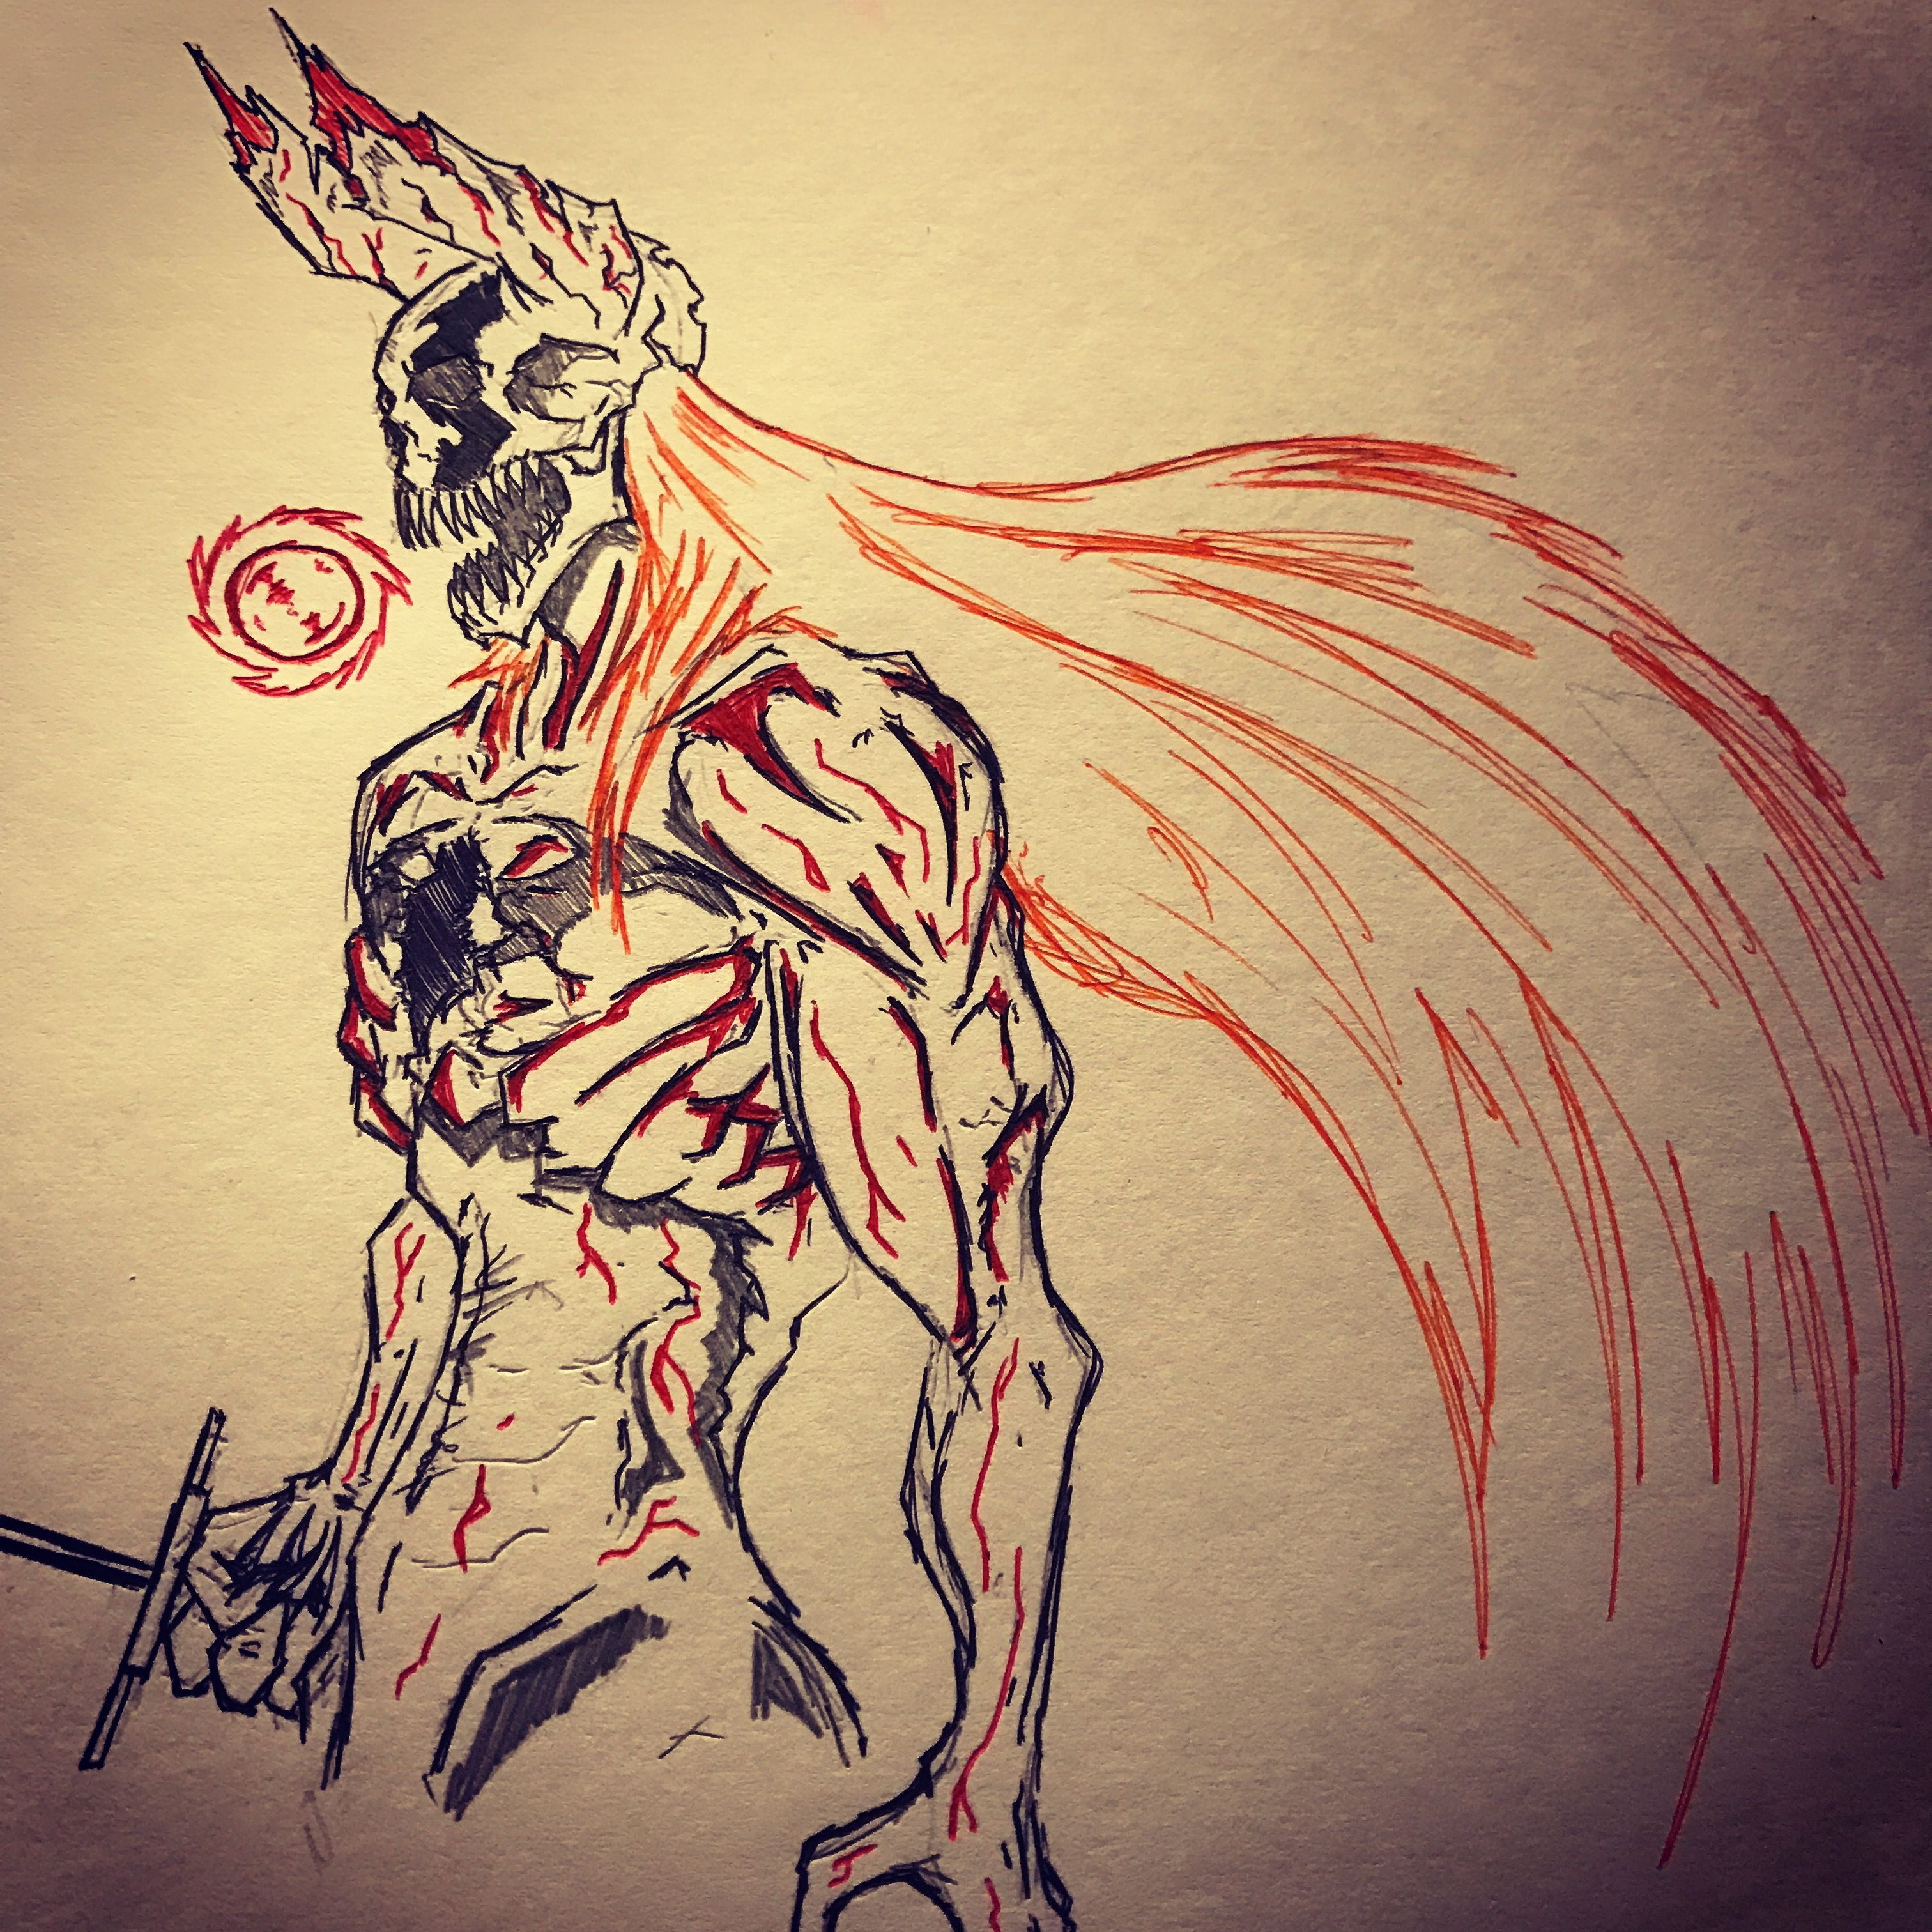 Bleach Ichigo Hollow, Sikcomicz Style | Inspiration | Pinterest ...